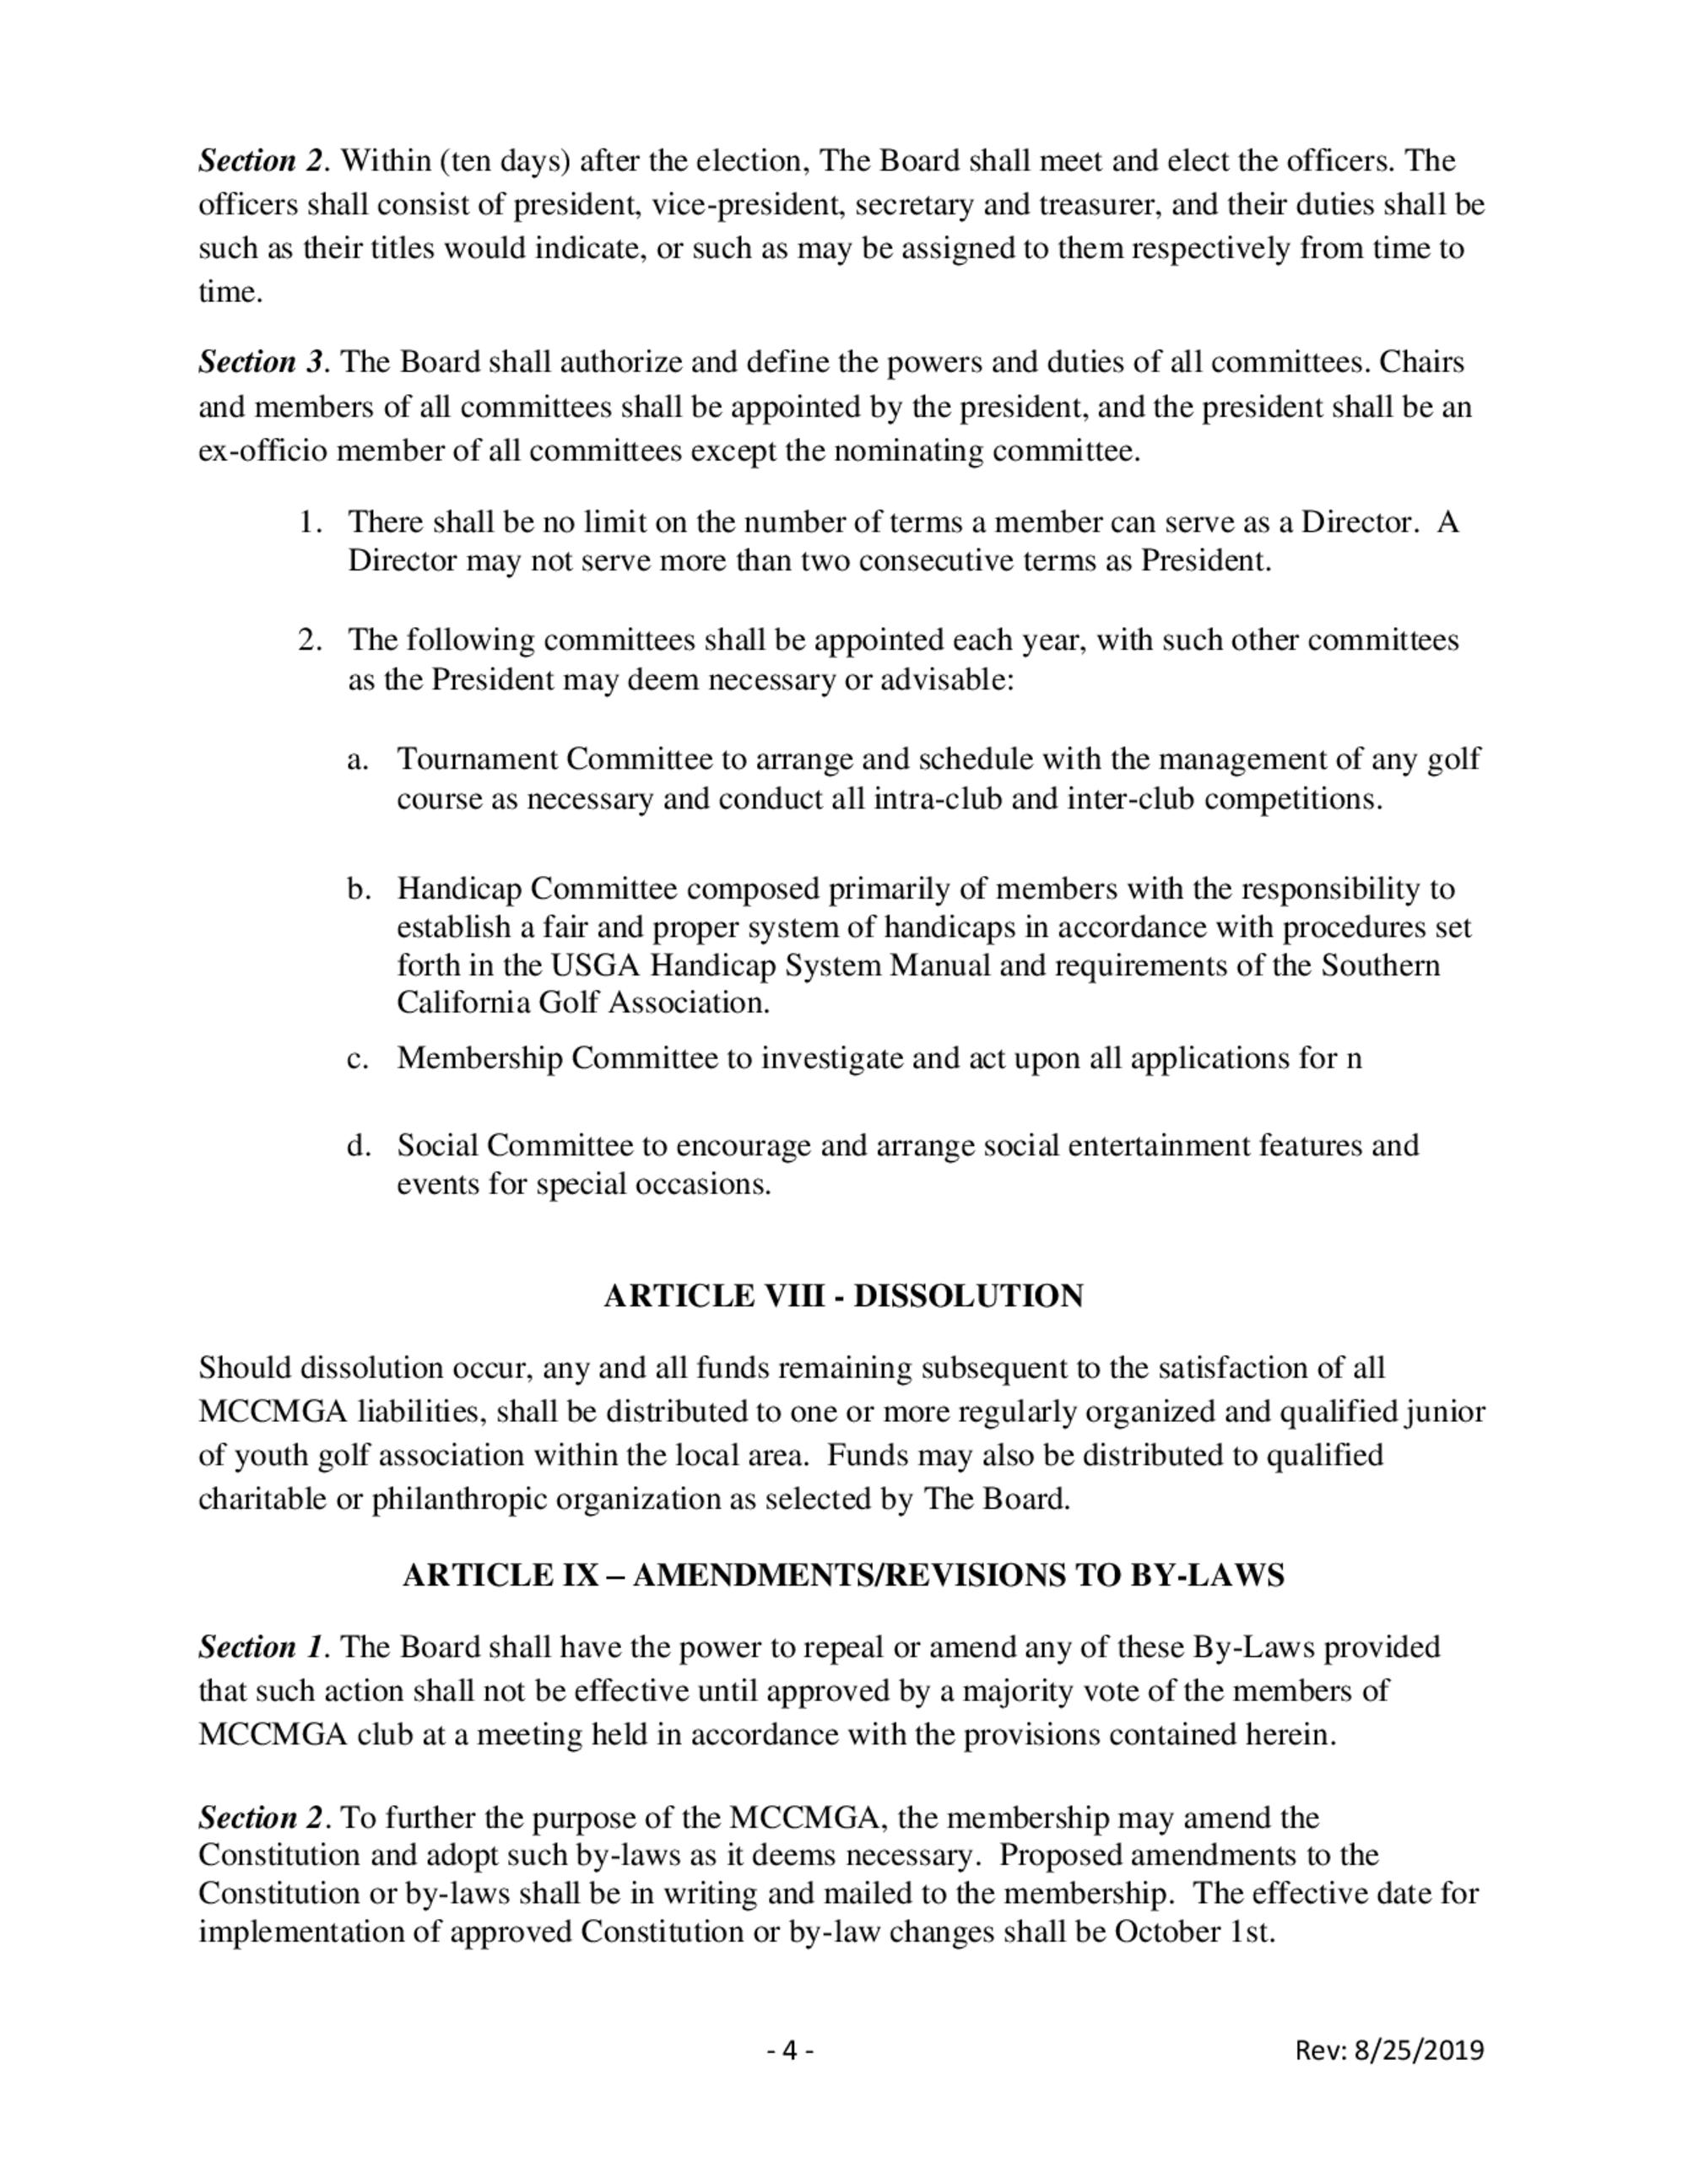 Mcc bylaws final 4